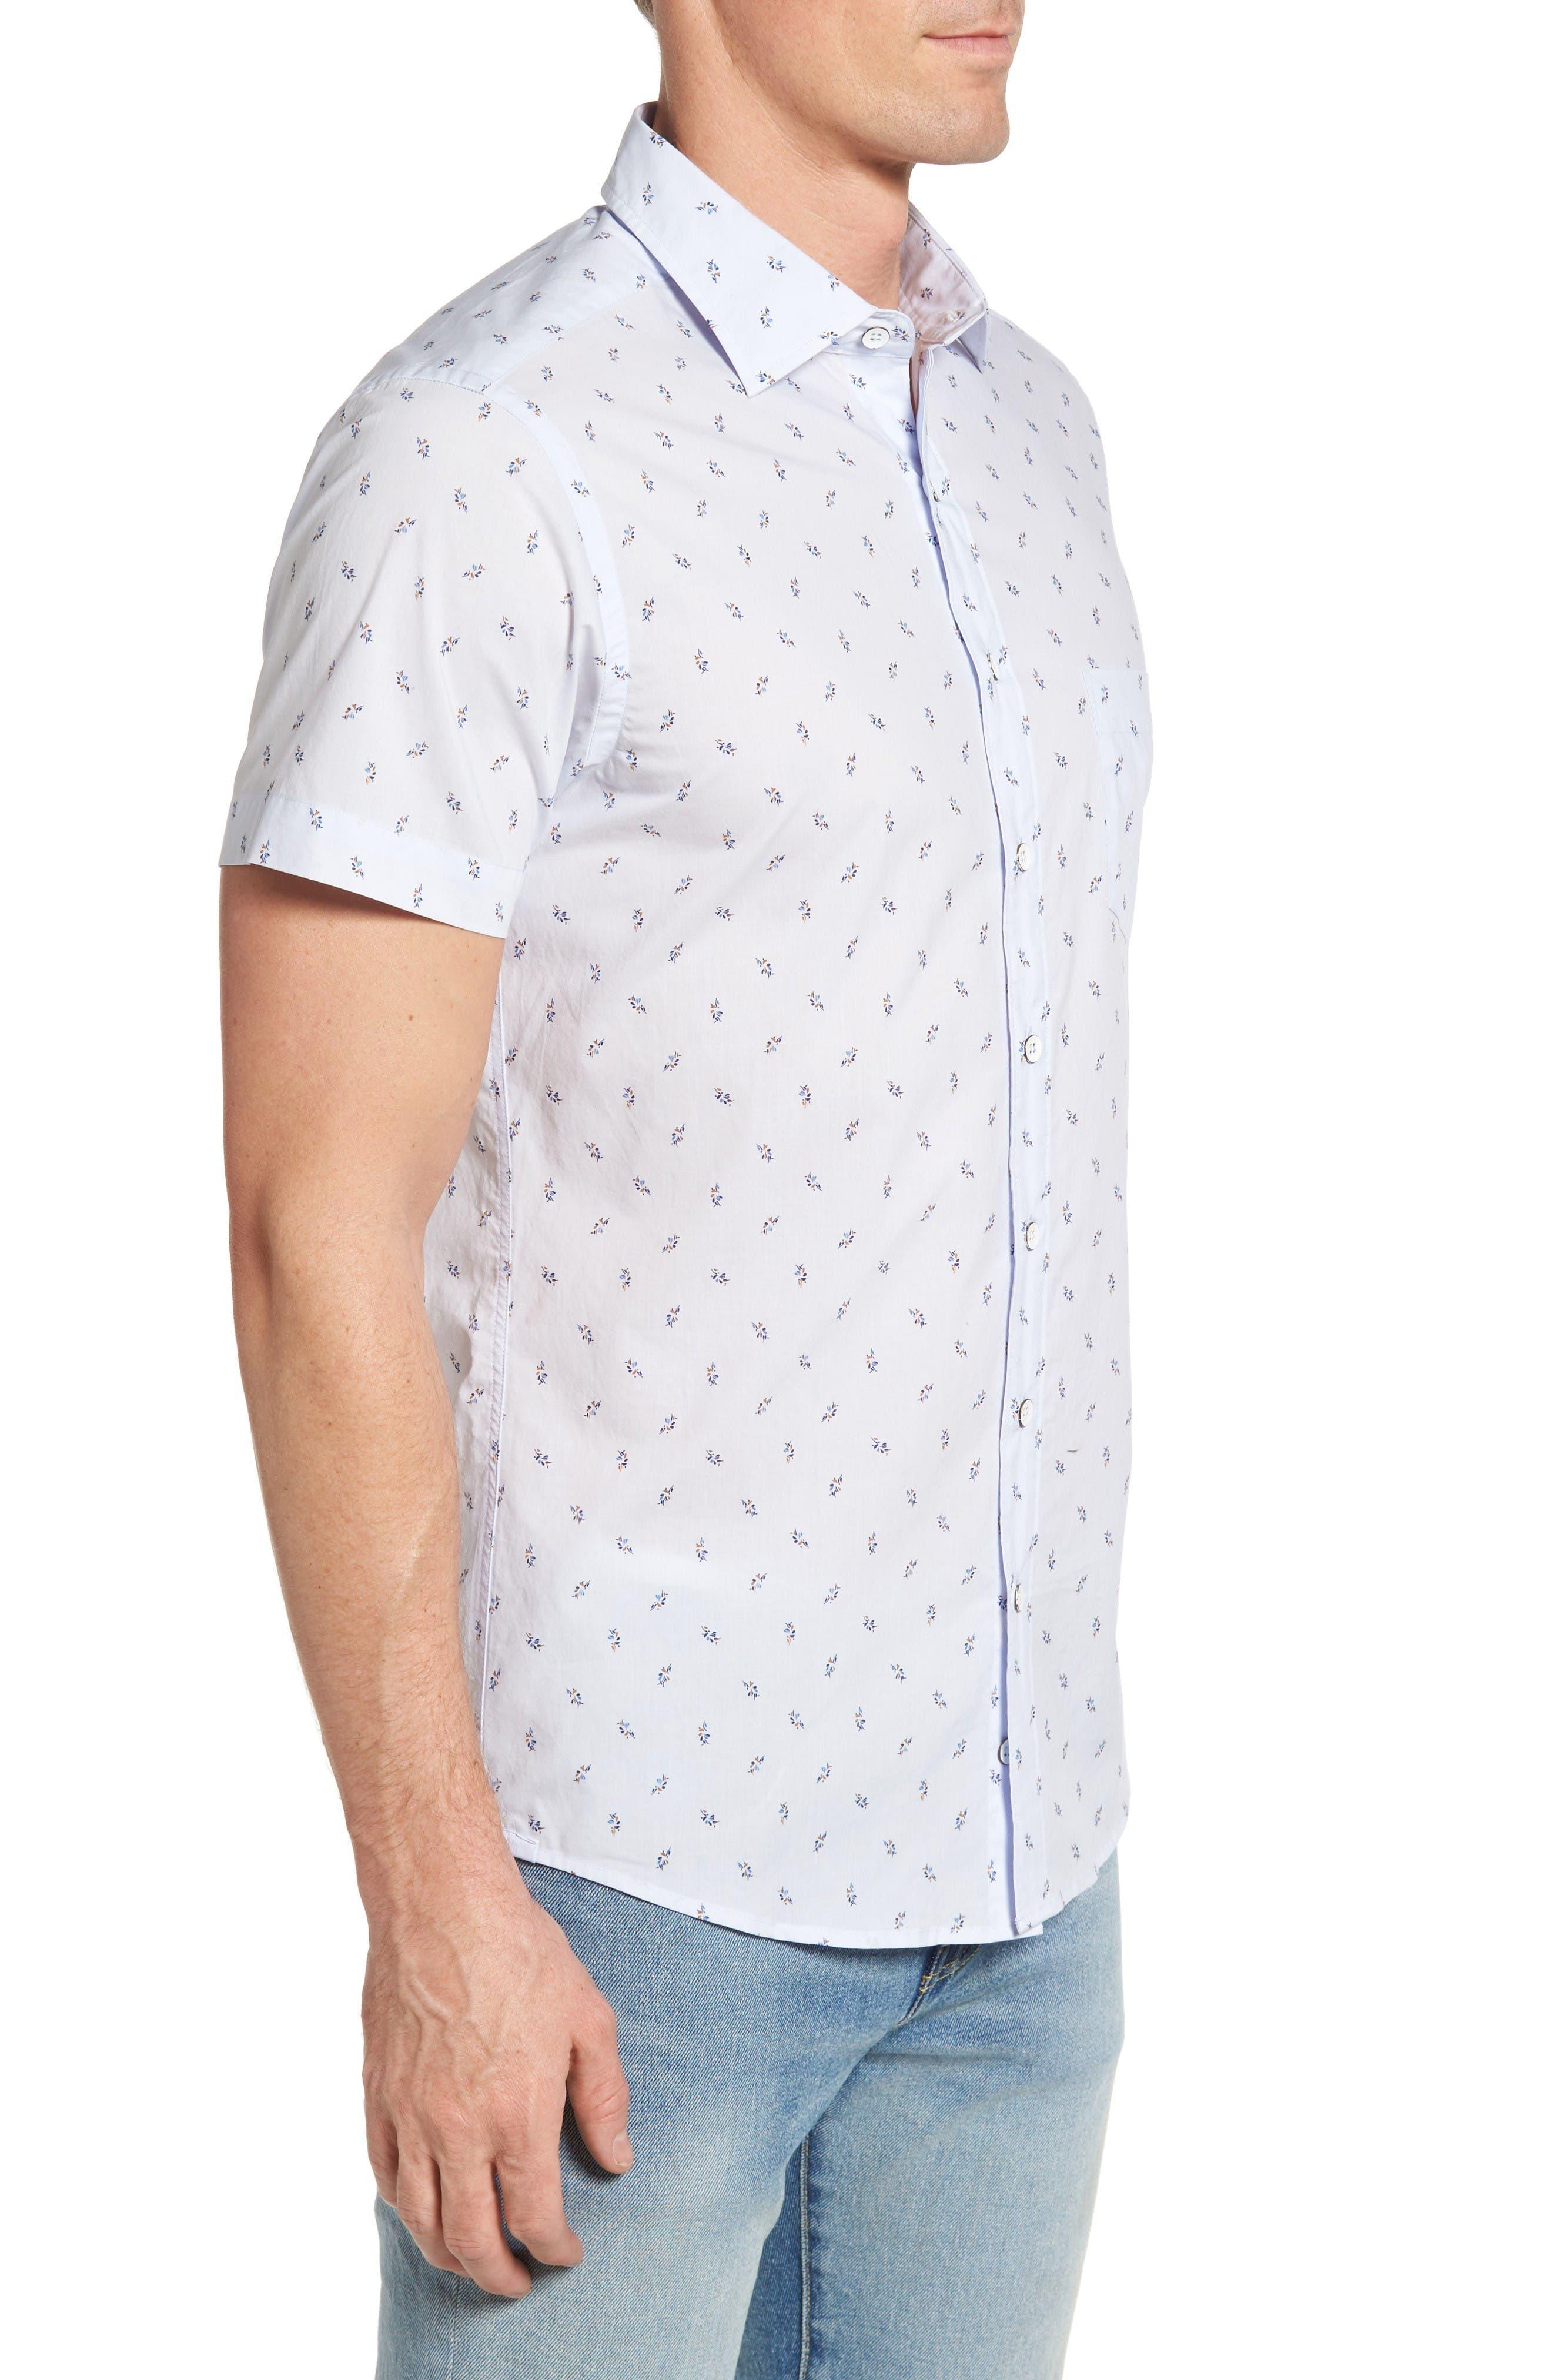 Waterfront Sport Shirt,                             Alternate thumbnail 4, color,                             Powder Blue